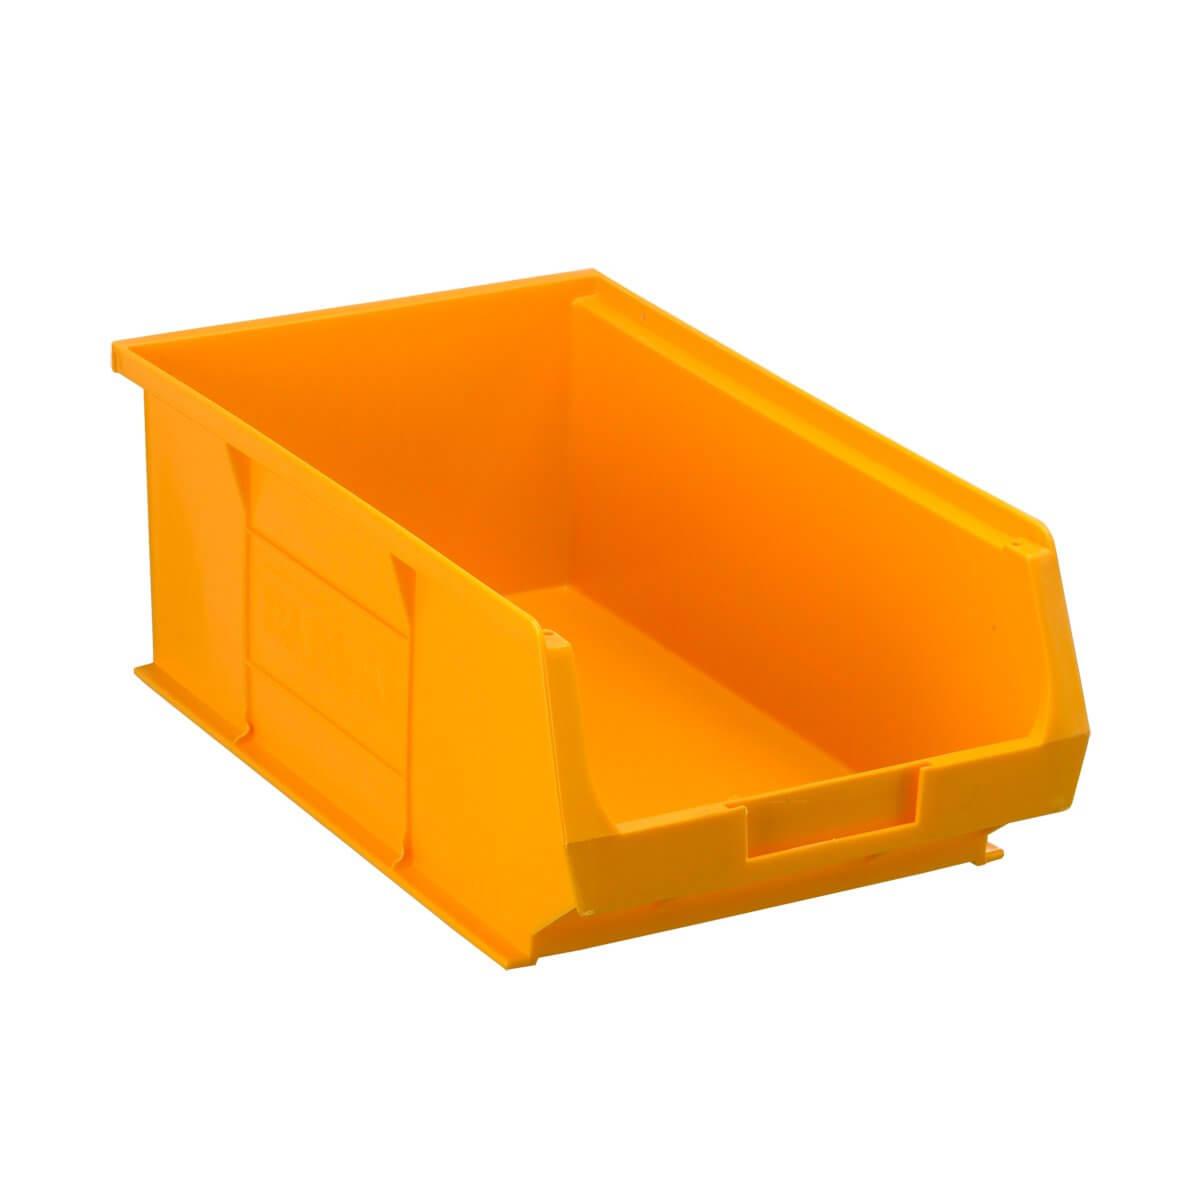 TC4 Picking Bin - Yellow